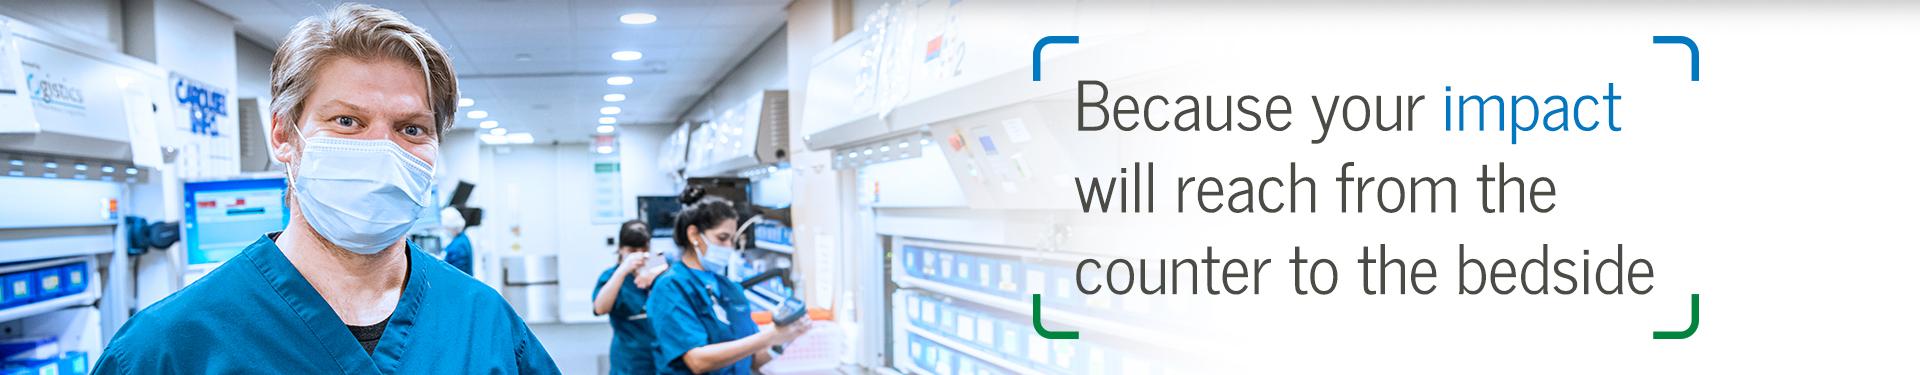 Pharmacy Desktop Image